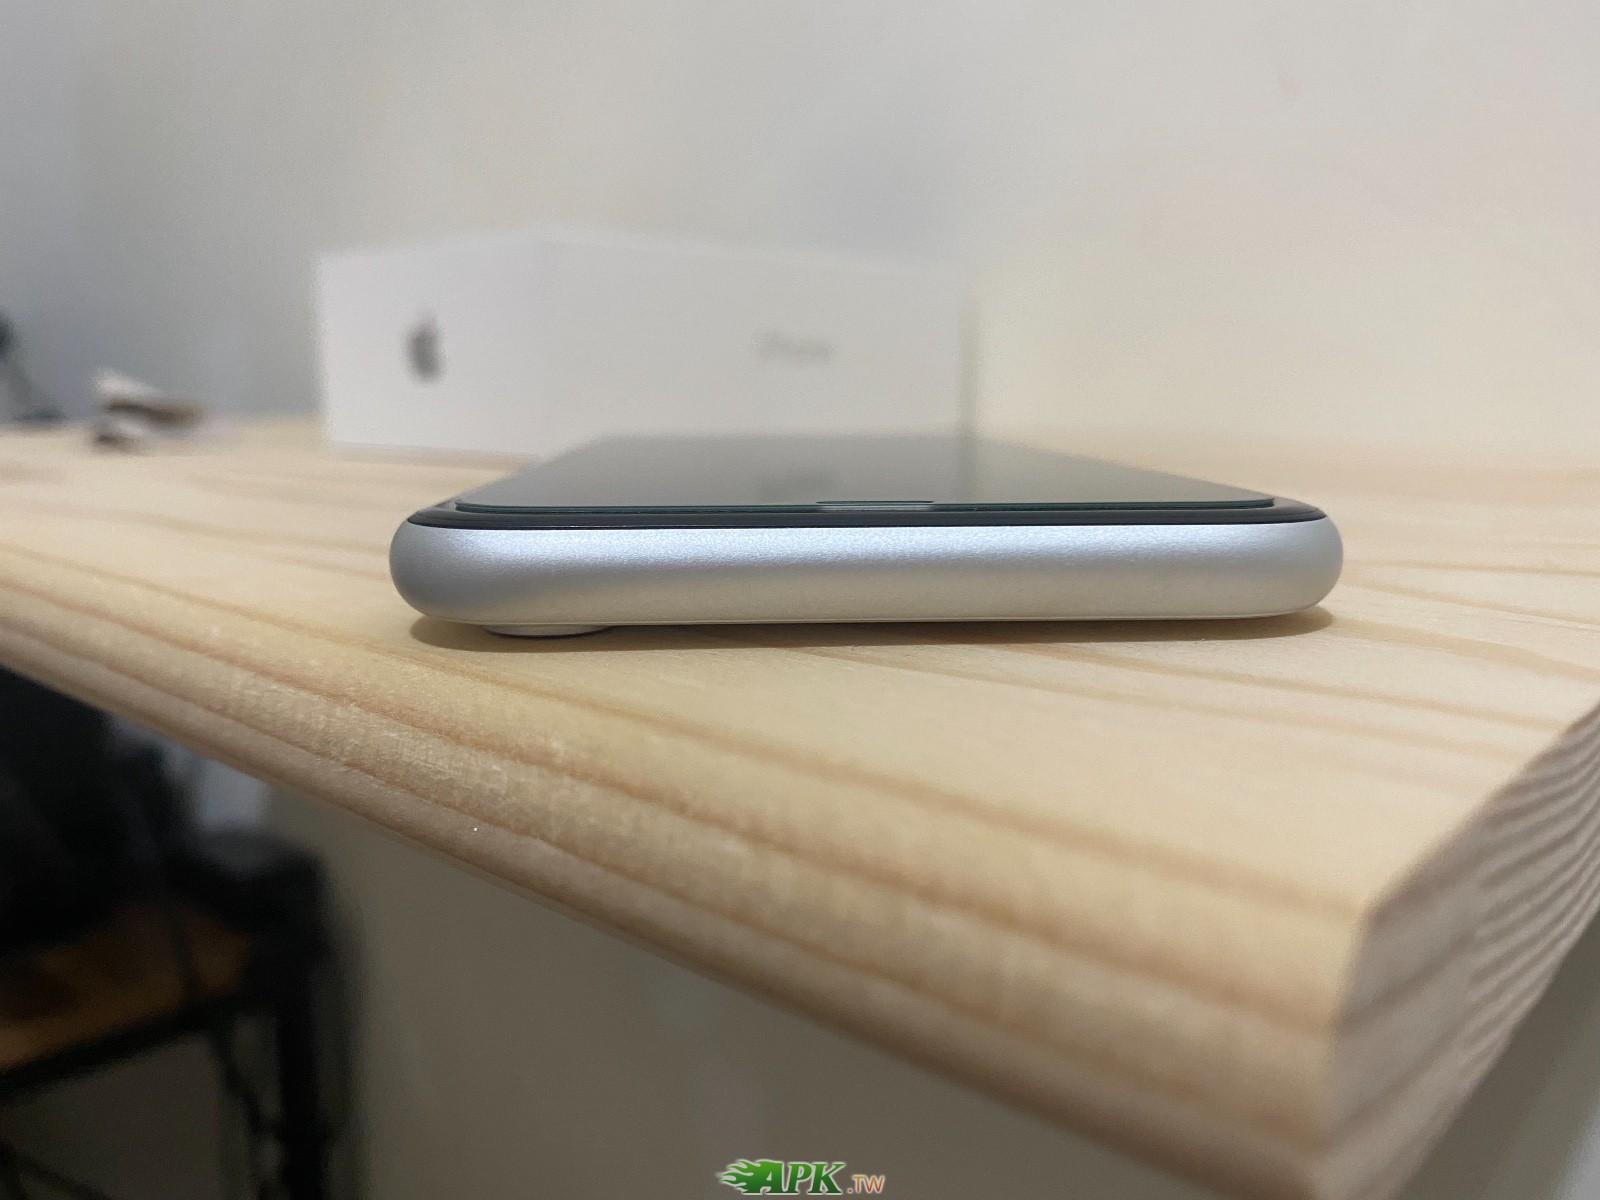 IphoneXR 64g電池健康96趴 心動不如馬上詢問